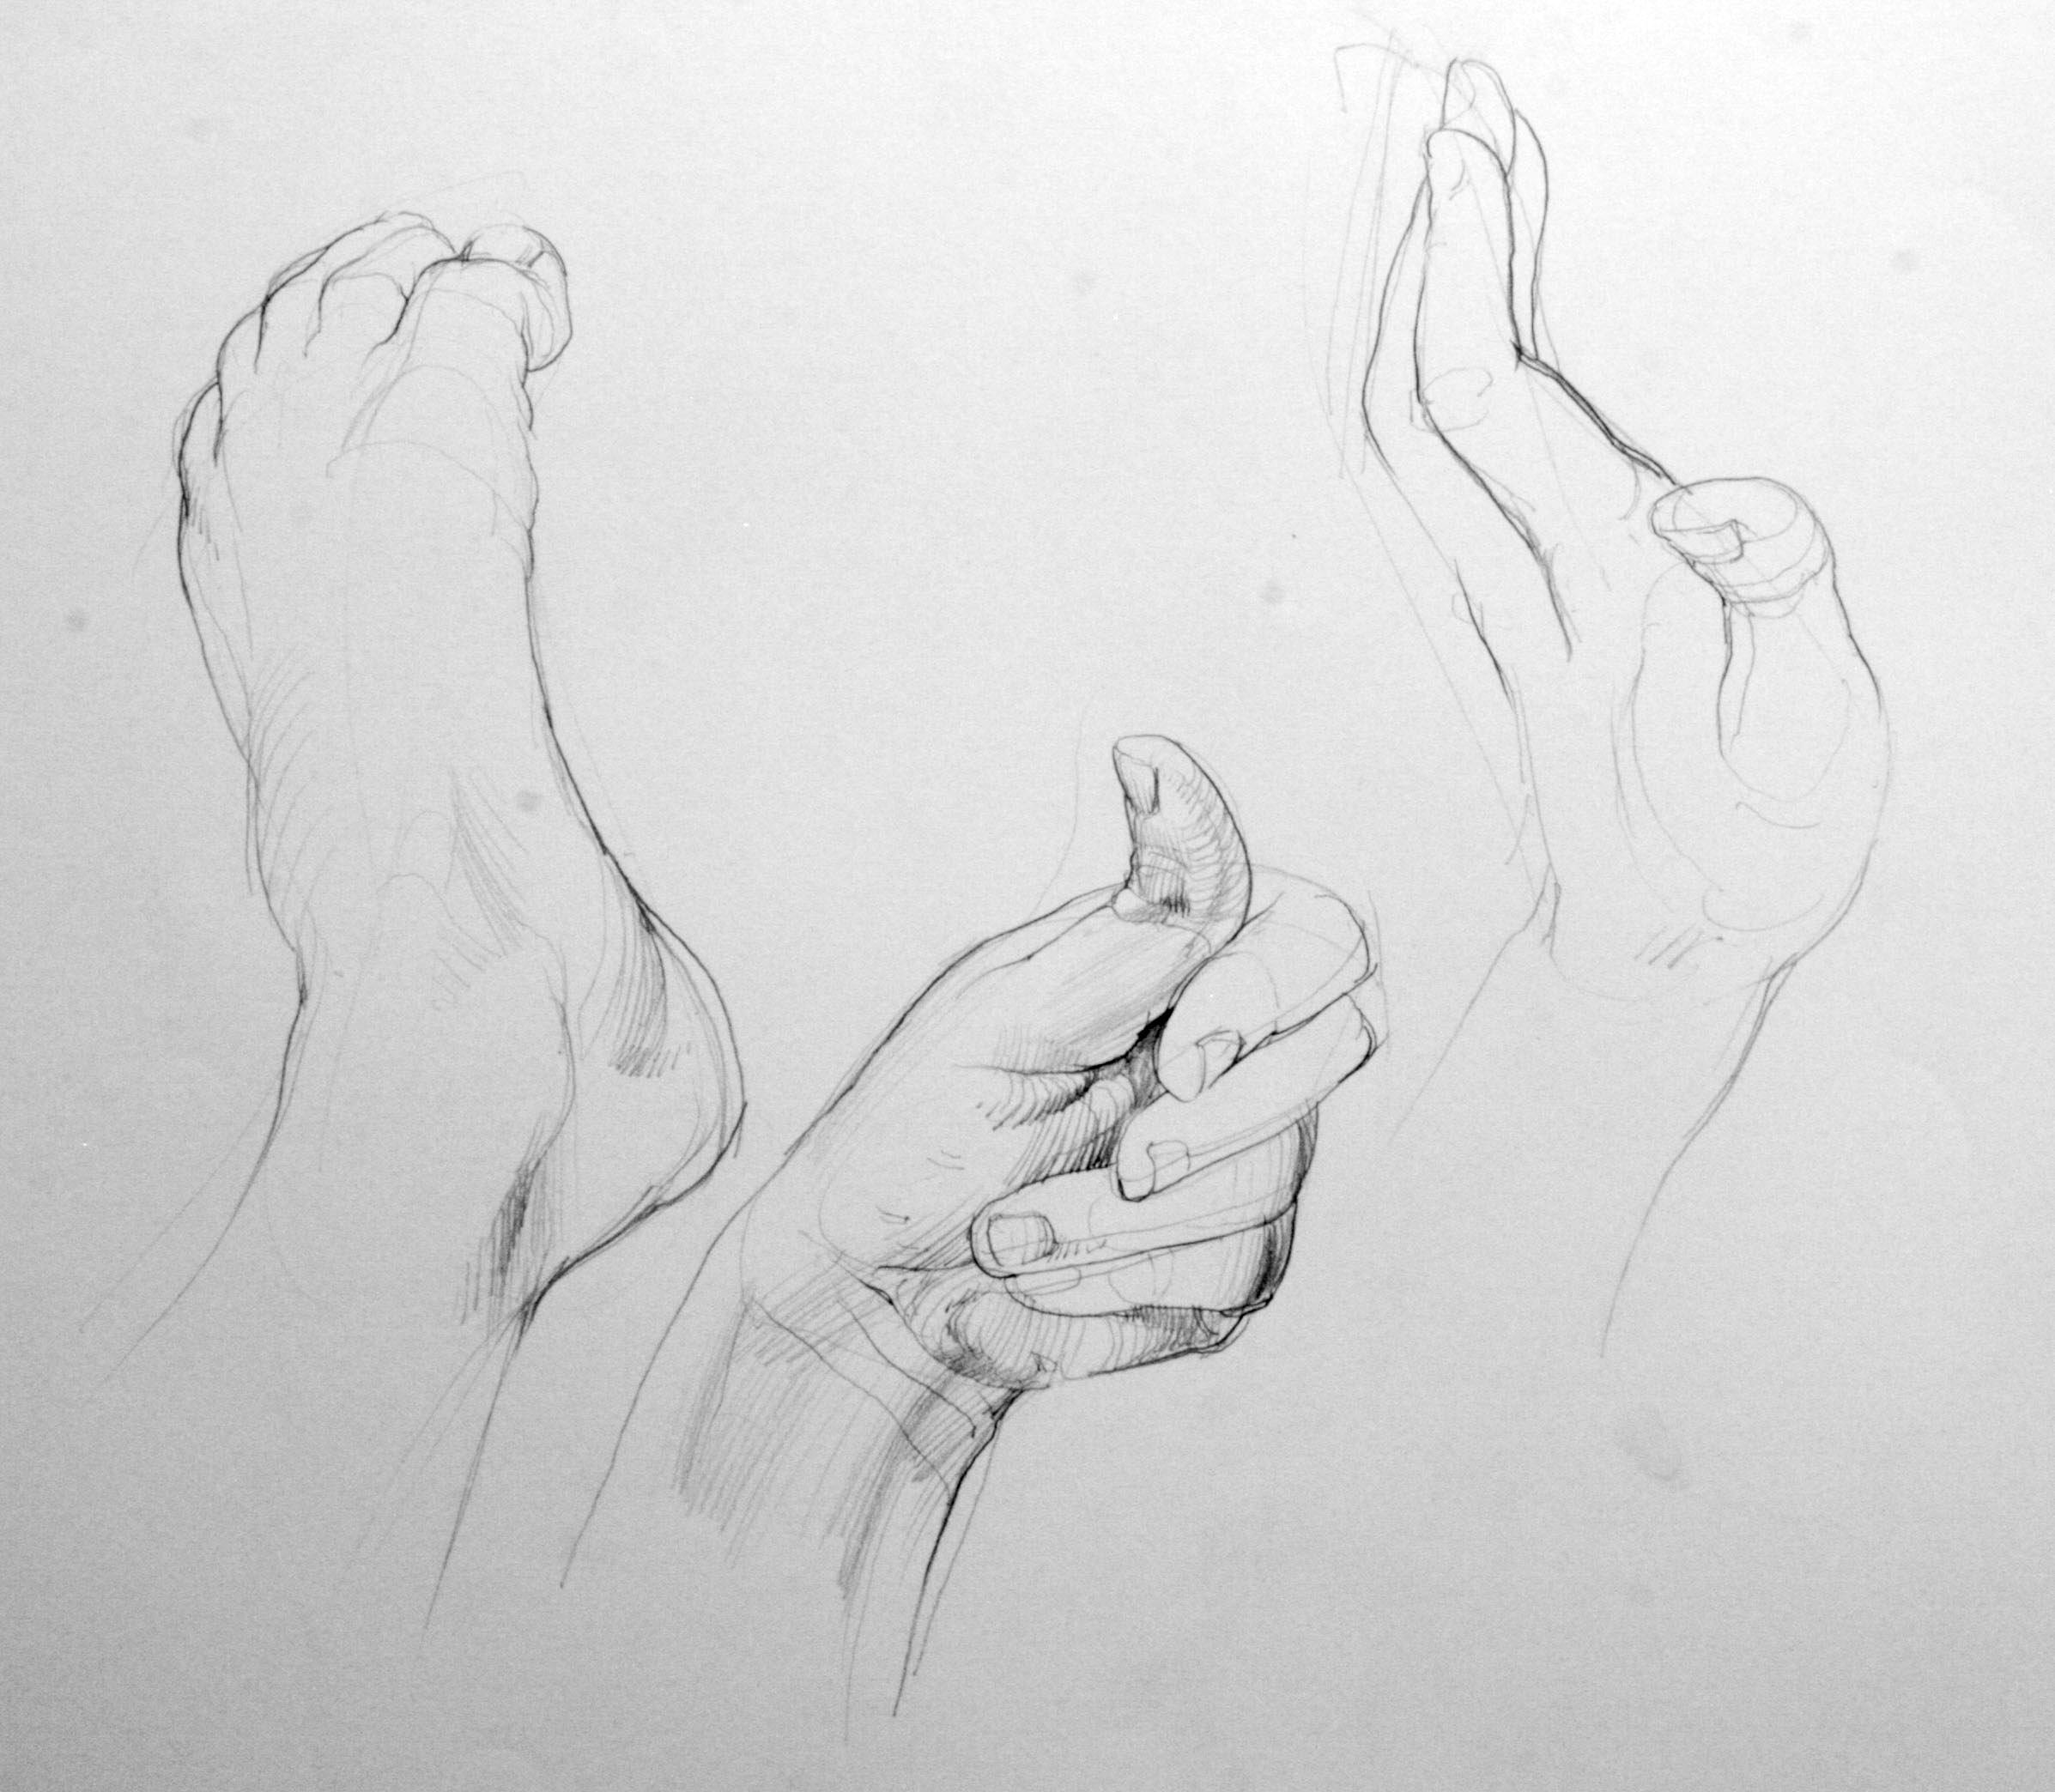 Scott+Breton+Life+Drawing+Nov+2015-25.jpg